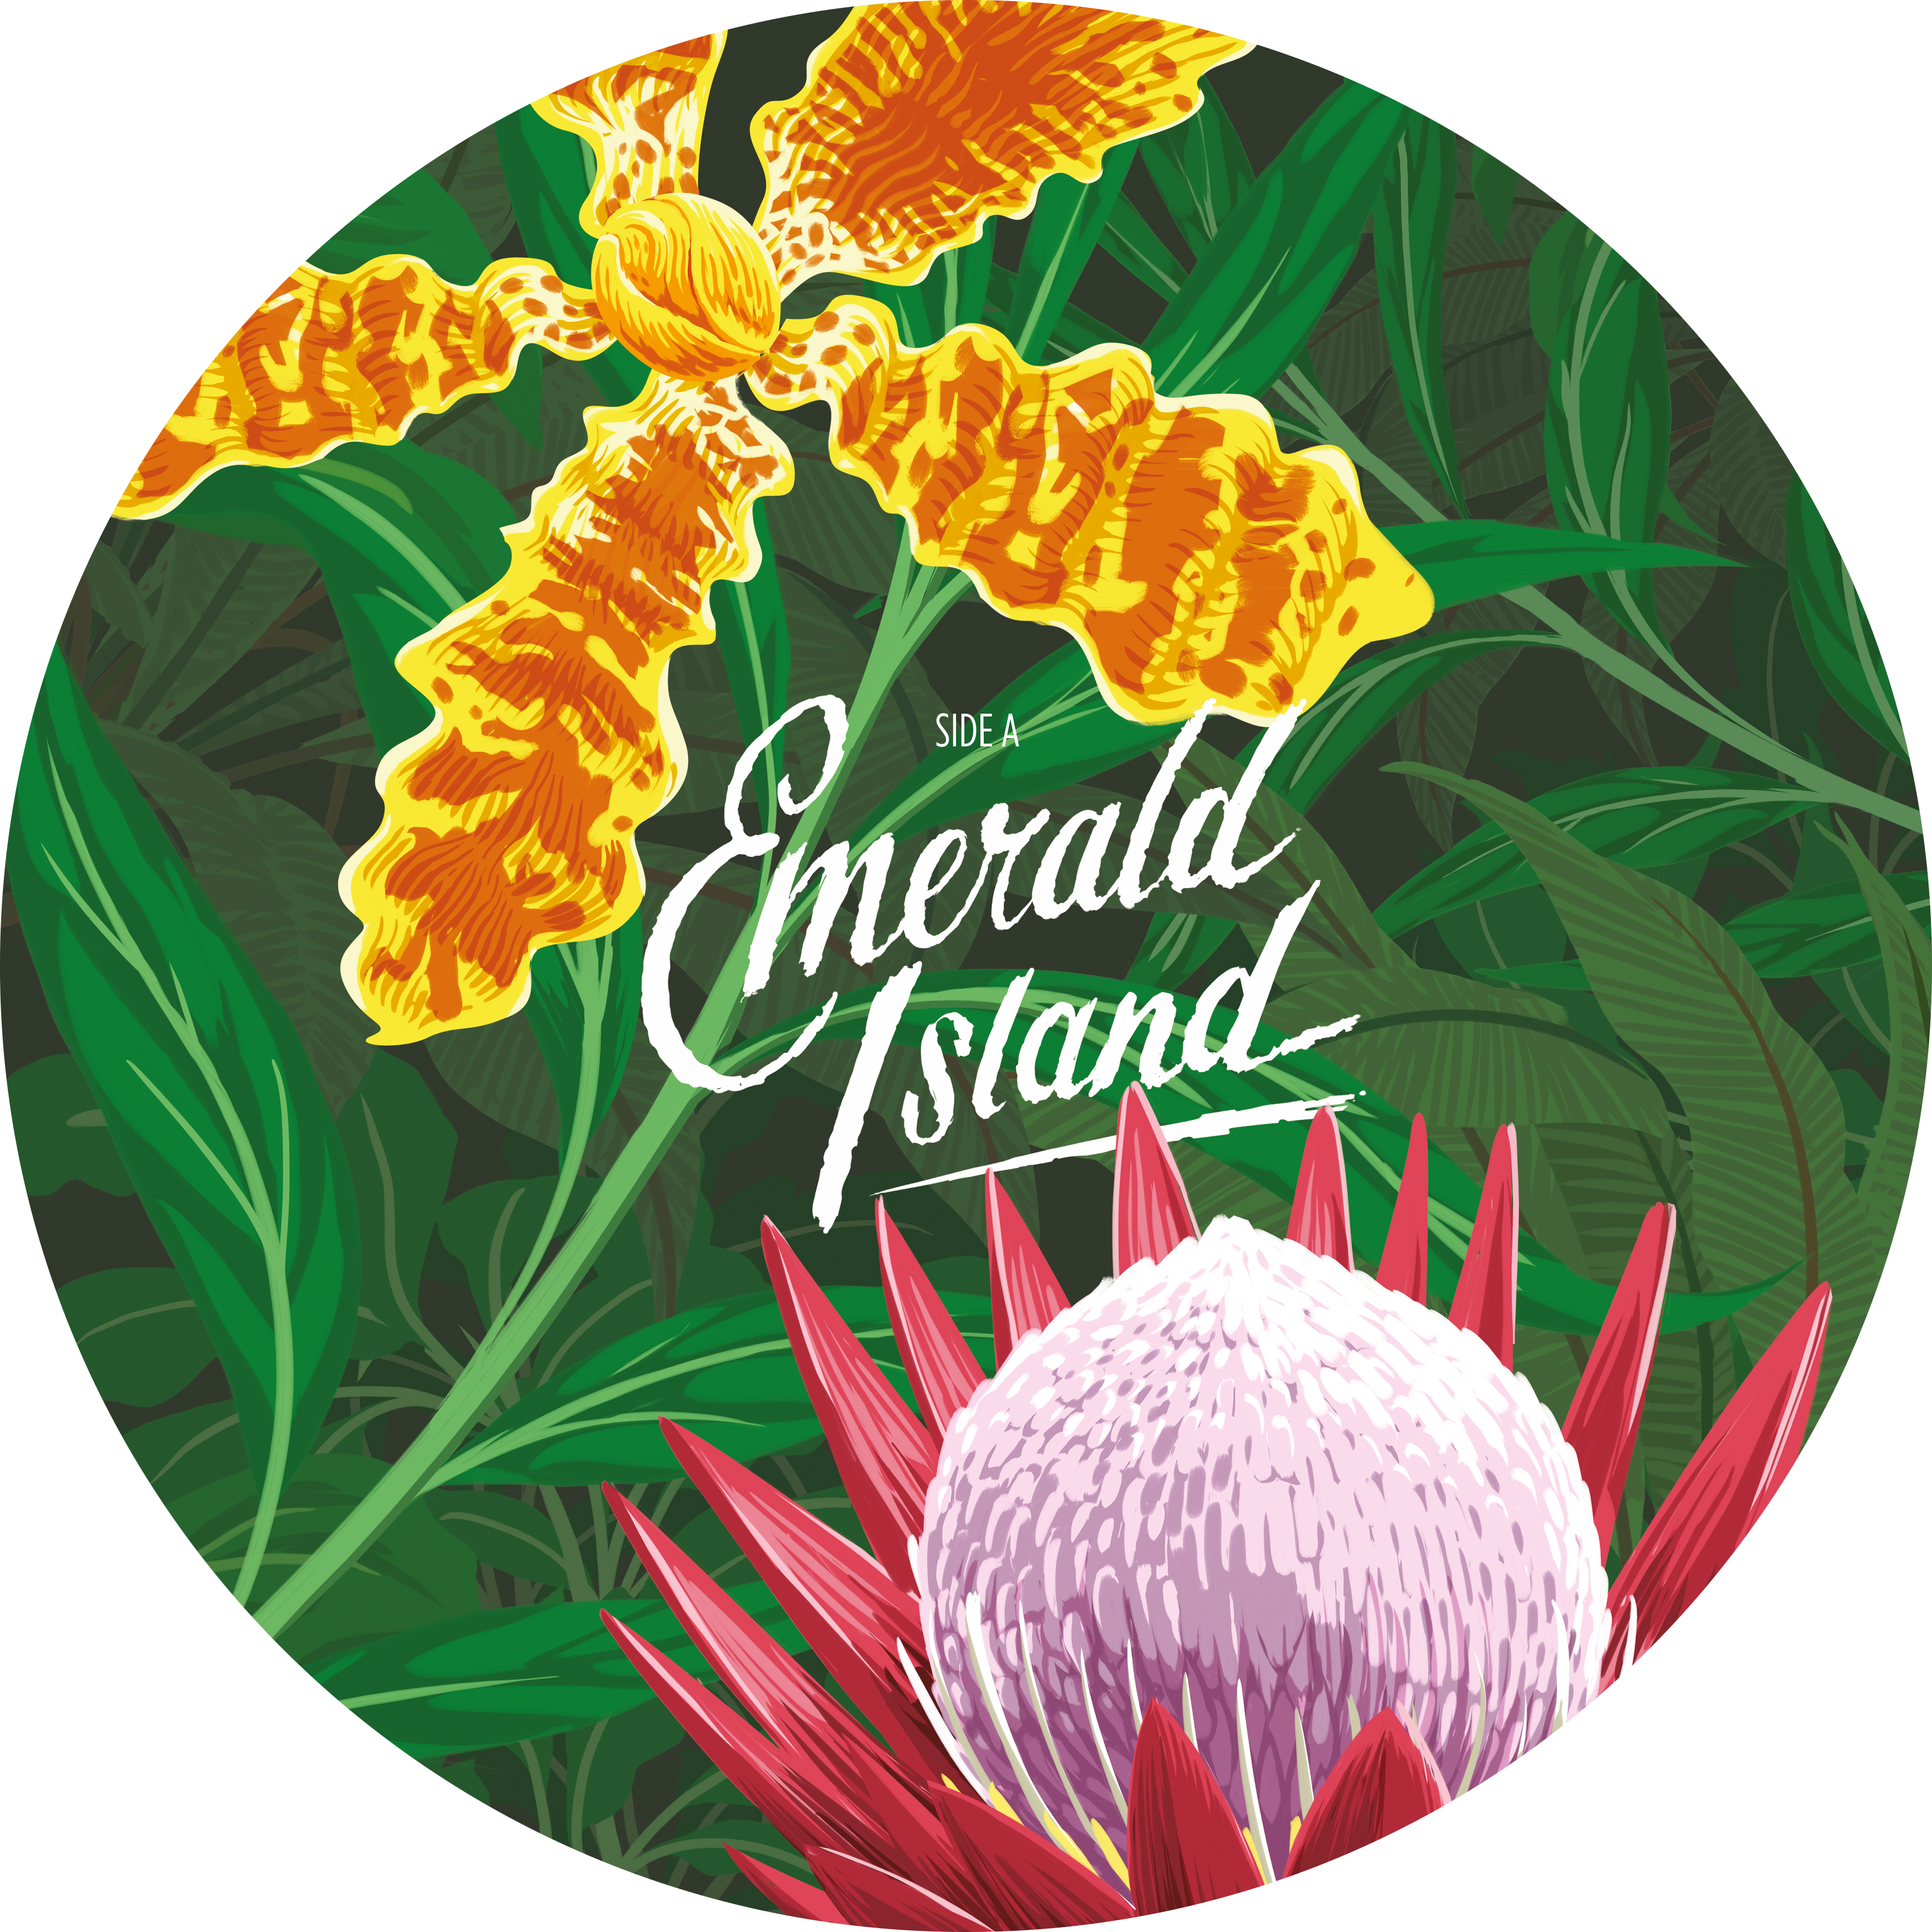 Caro emerald island ep. Clipart music music room